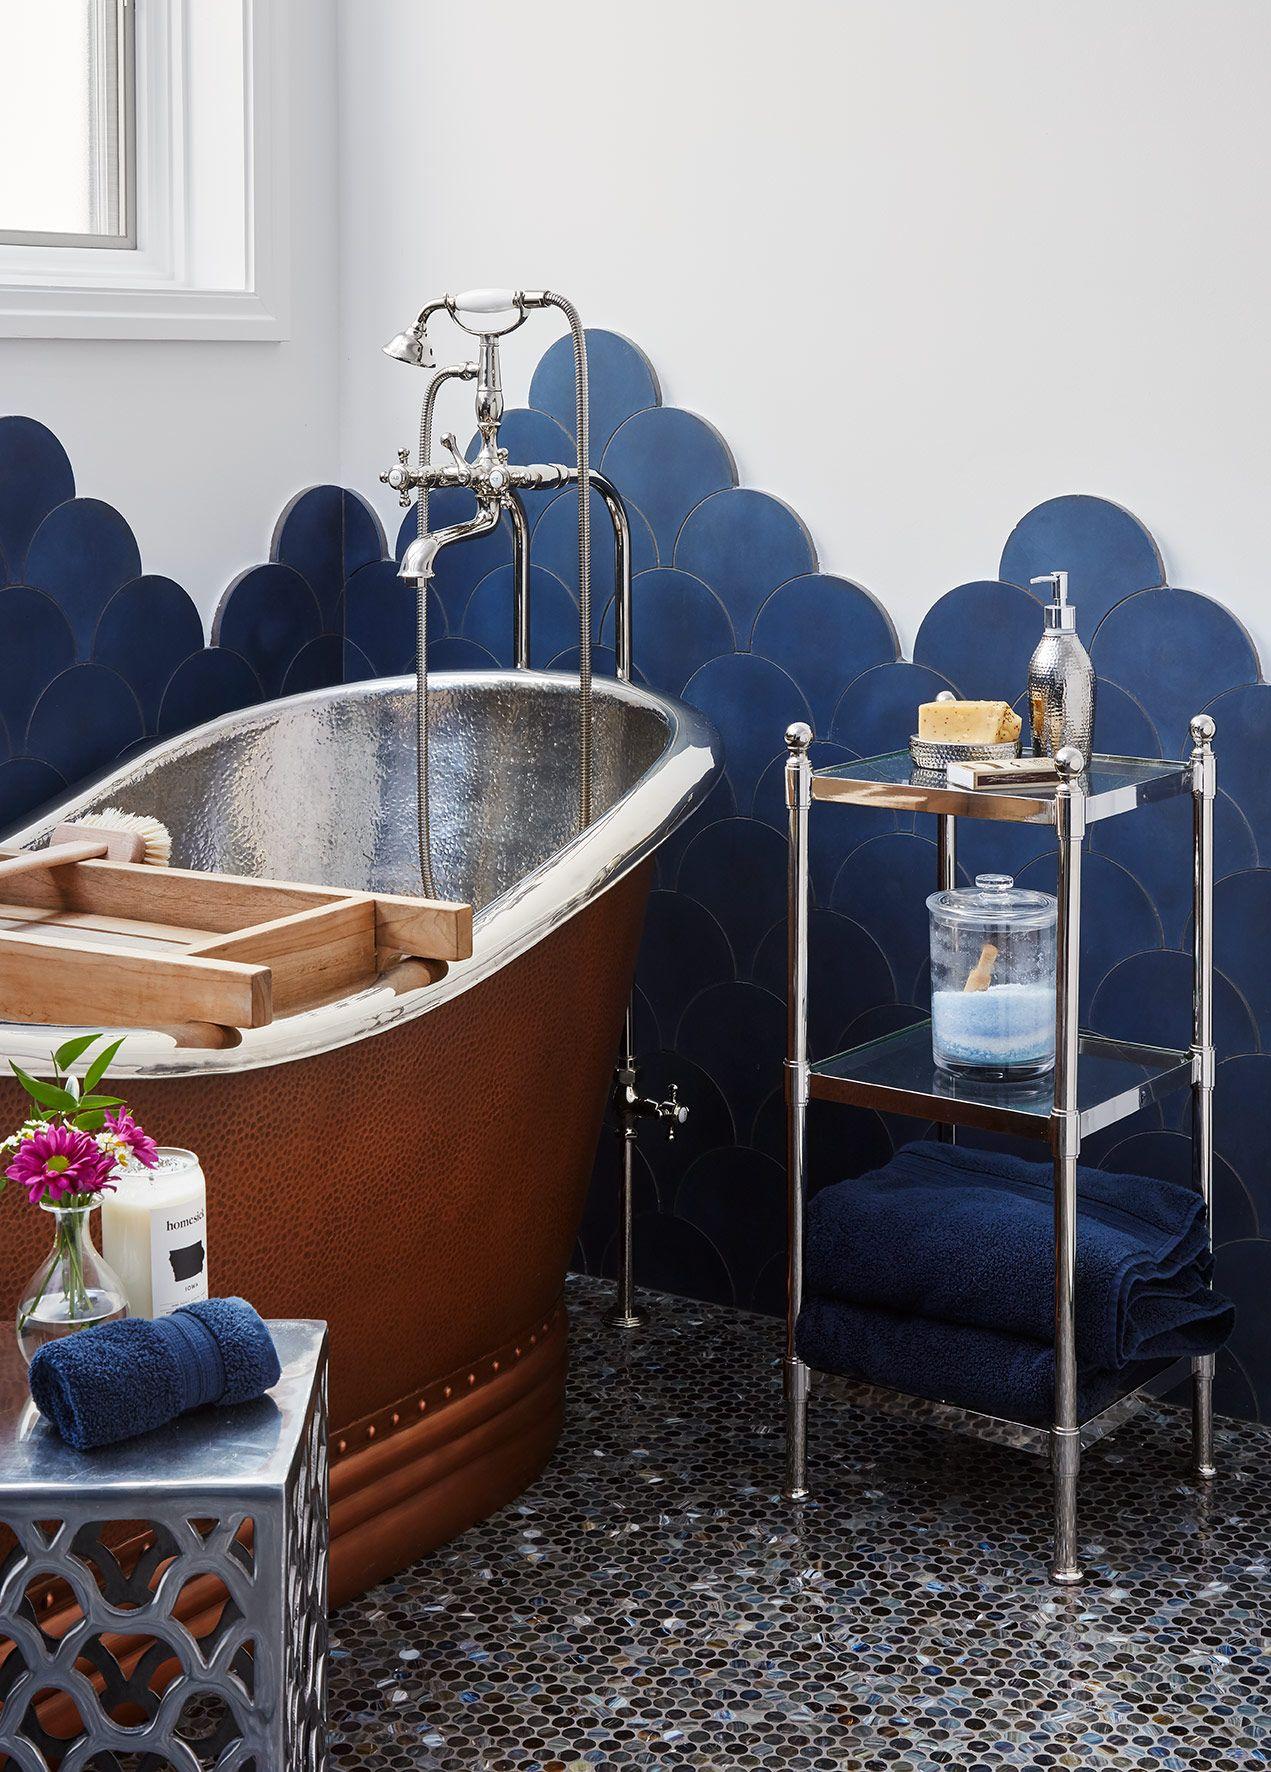 Creative Tile Turns A Scary 90s Bathroom Into A Fresh Fun Space